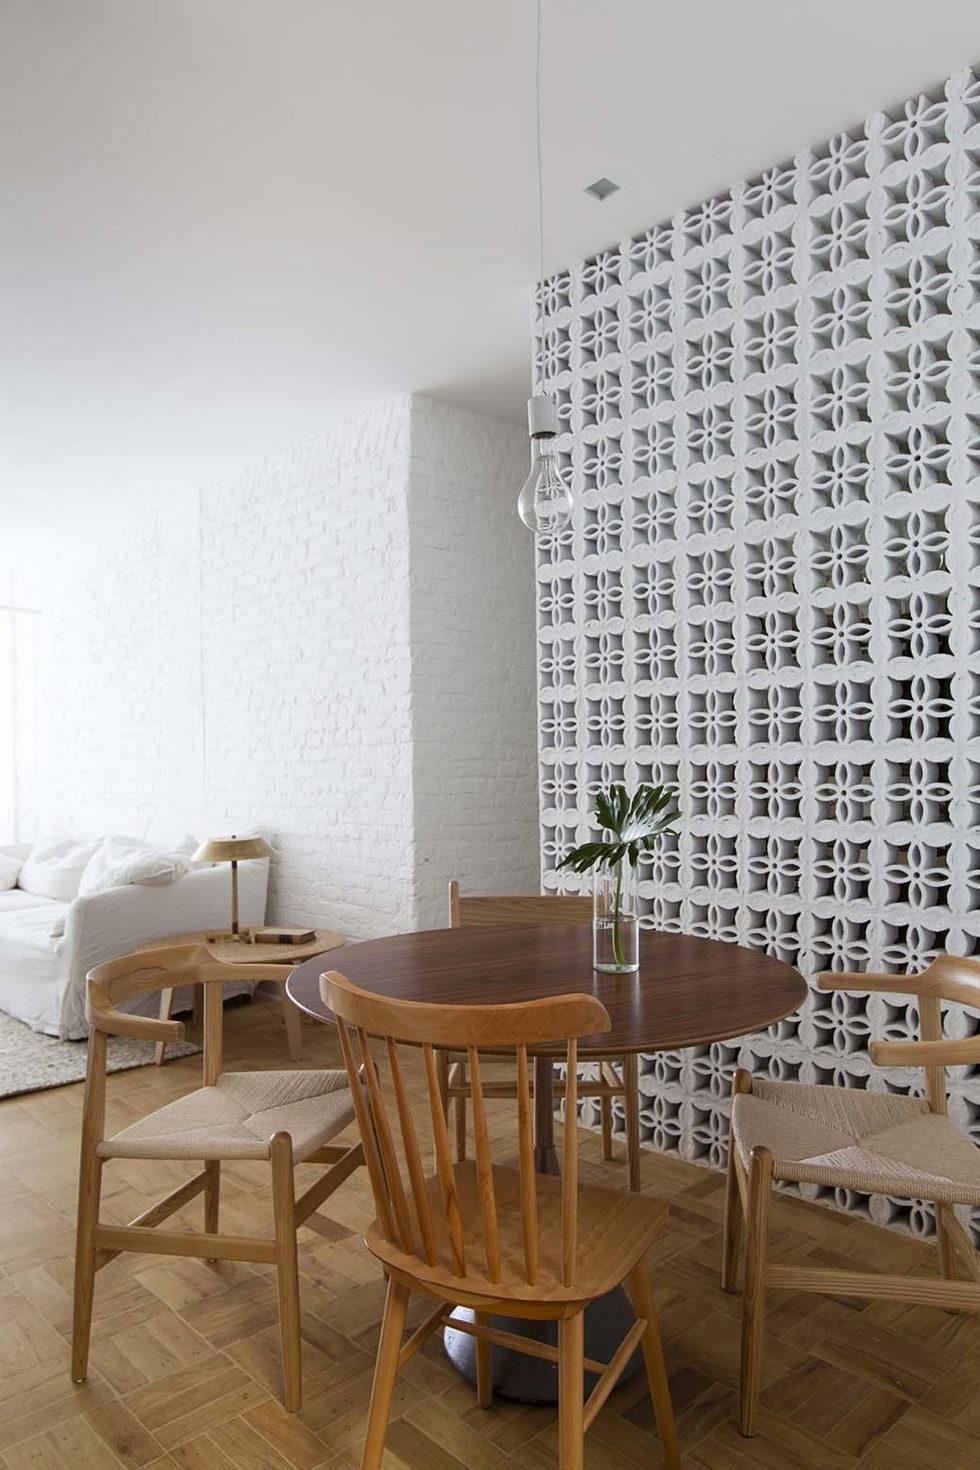 ap-cobogo-the-apartments-in-sao-paulo-2